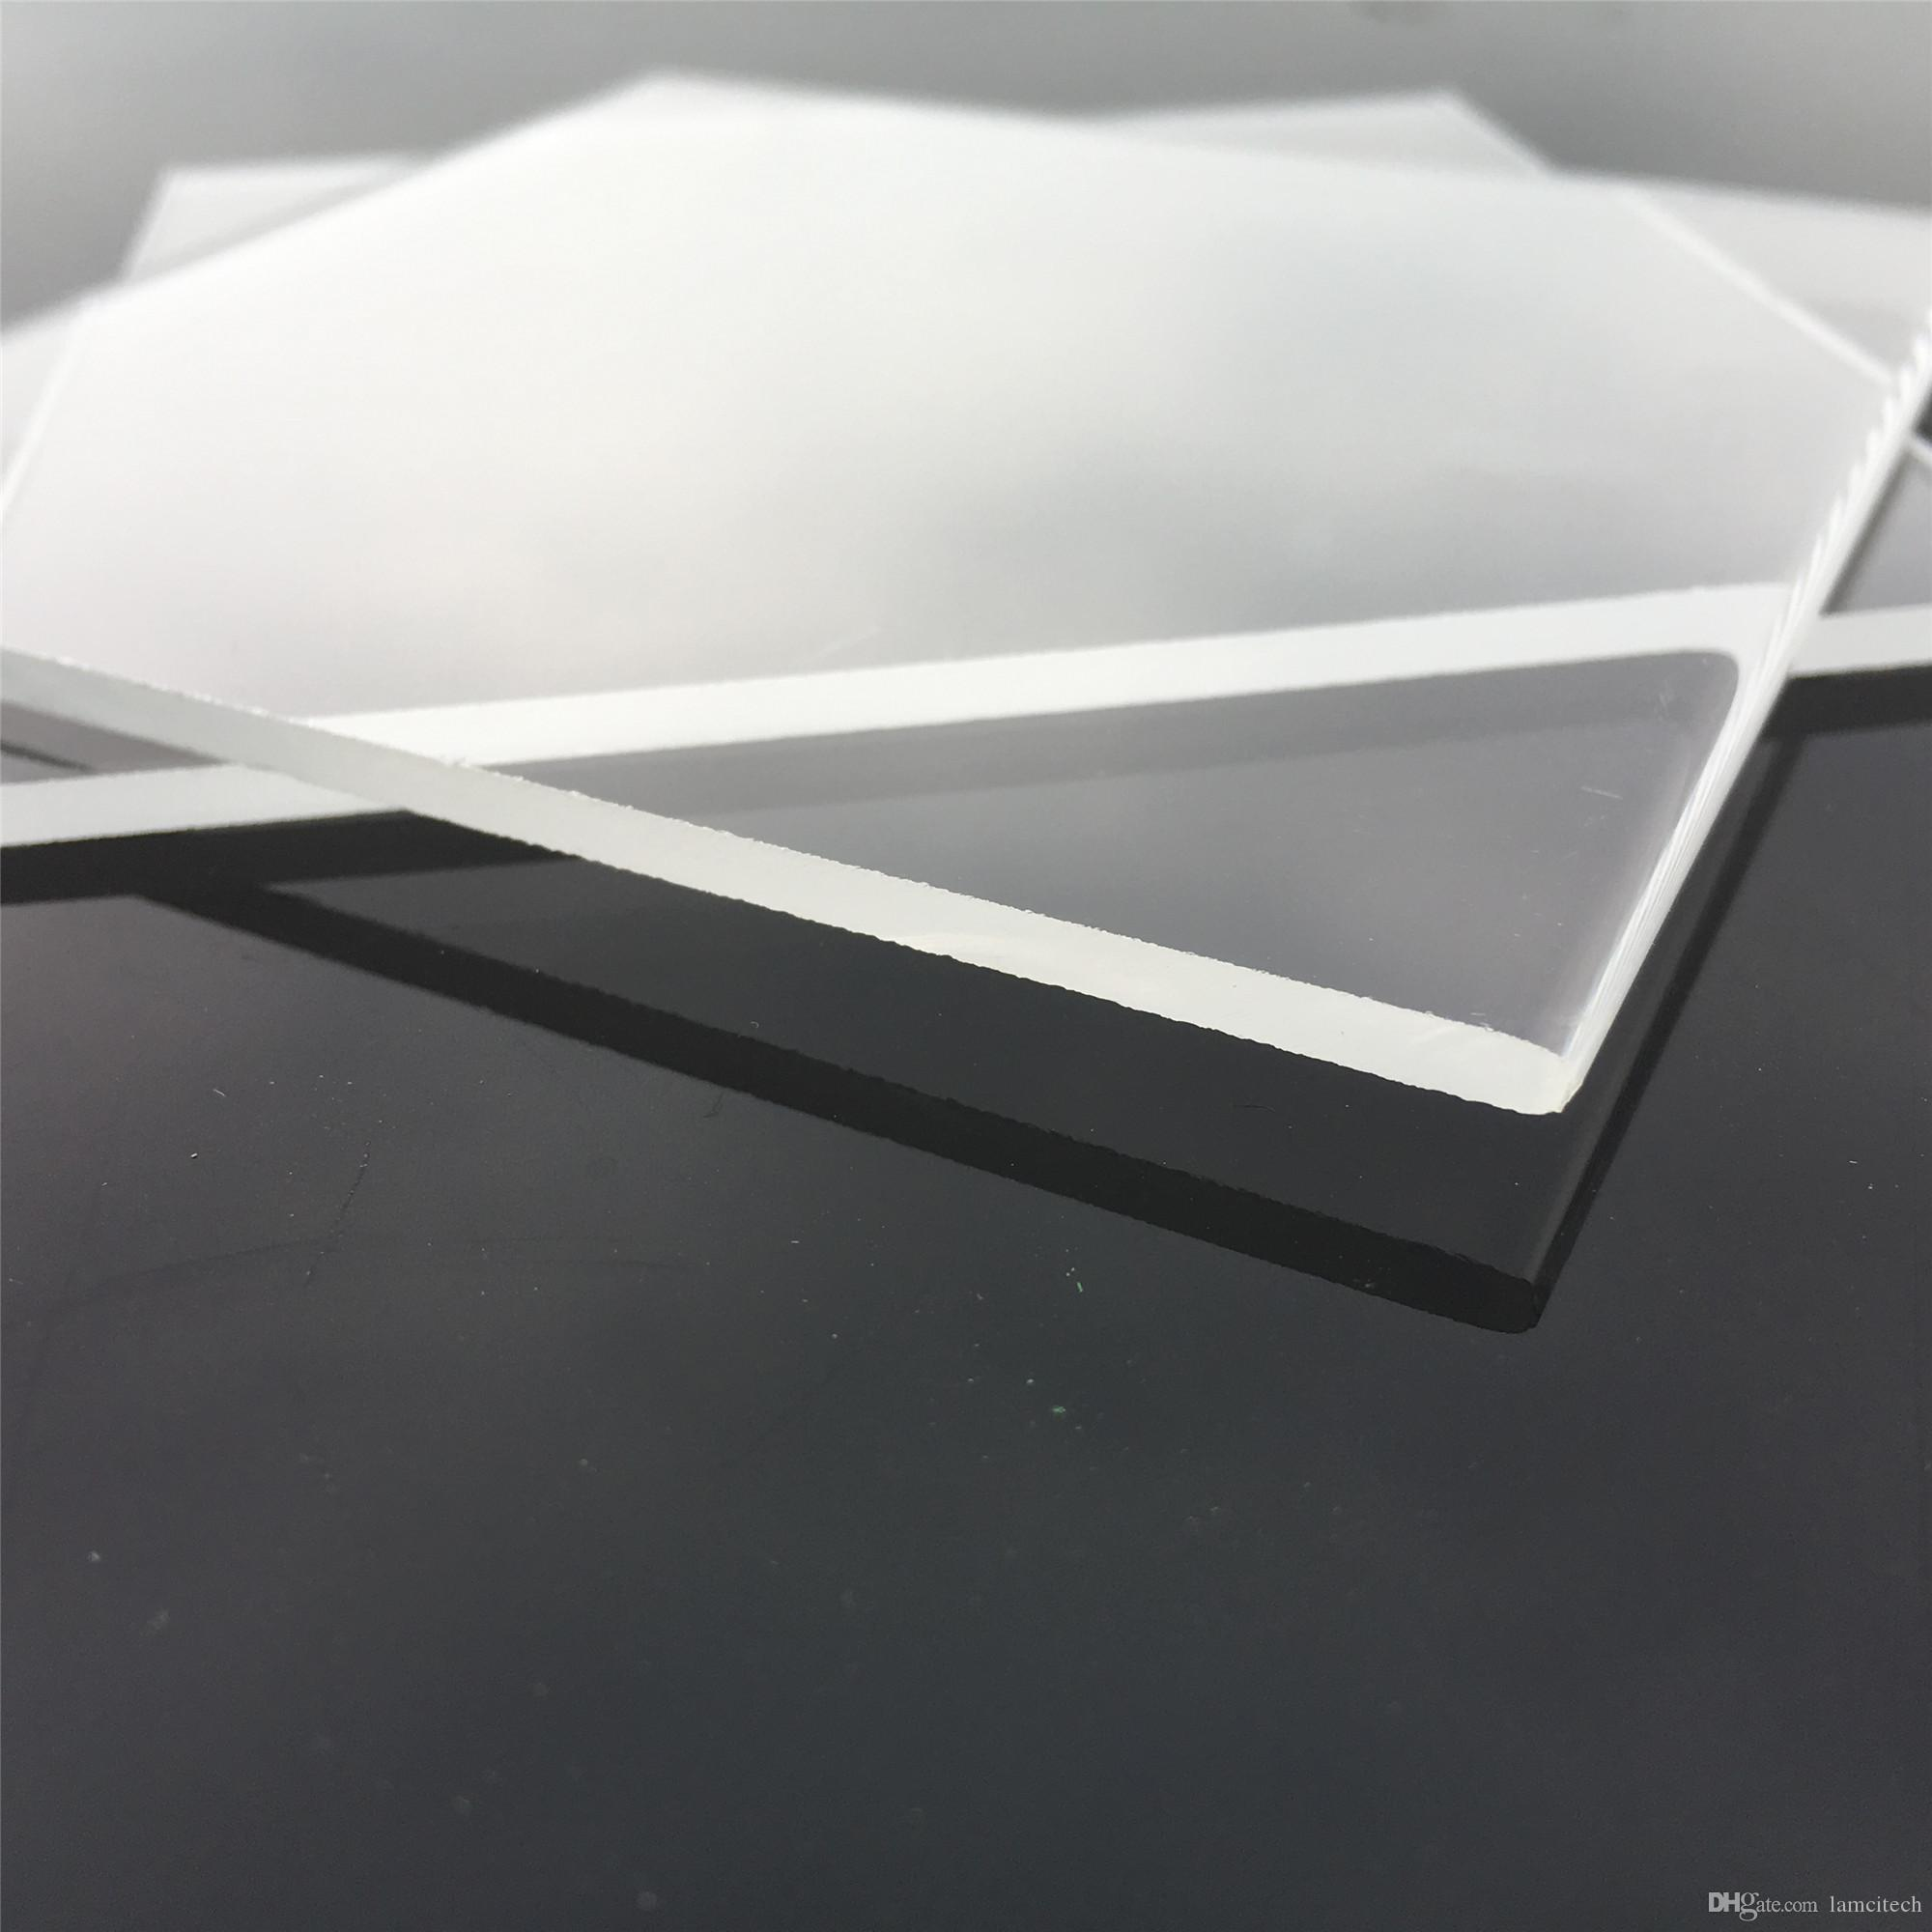 High Quality Industrial Quartz Plate 105mm Square Quartz Clear Plates 3mm Thick Quartz Glass Piezoid Sheet for Many Uses